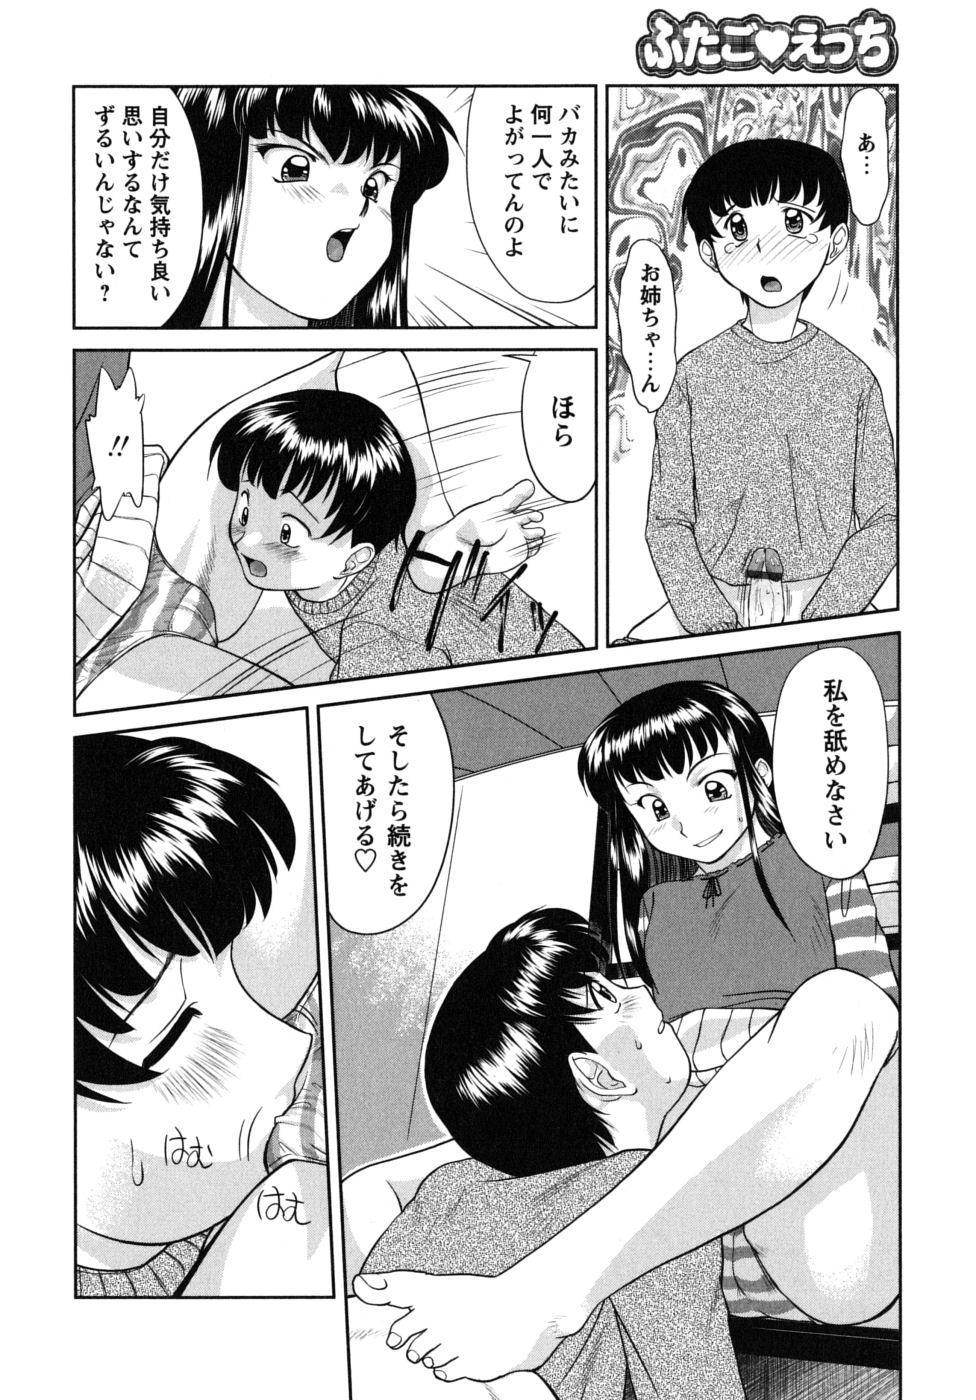 Futa Go Ecchi 93